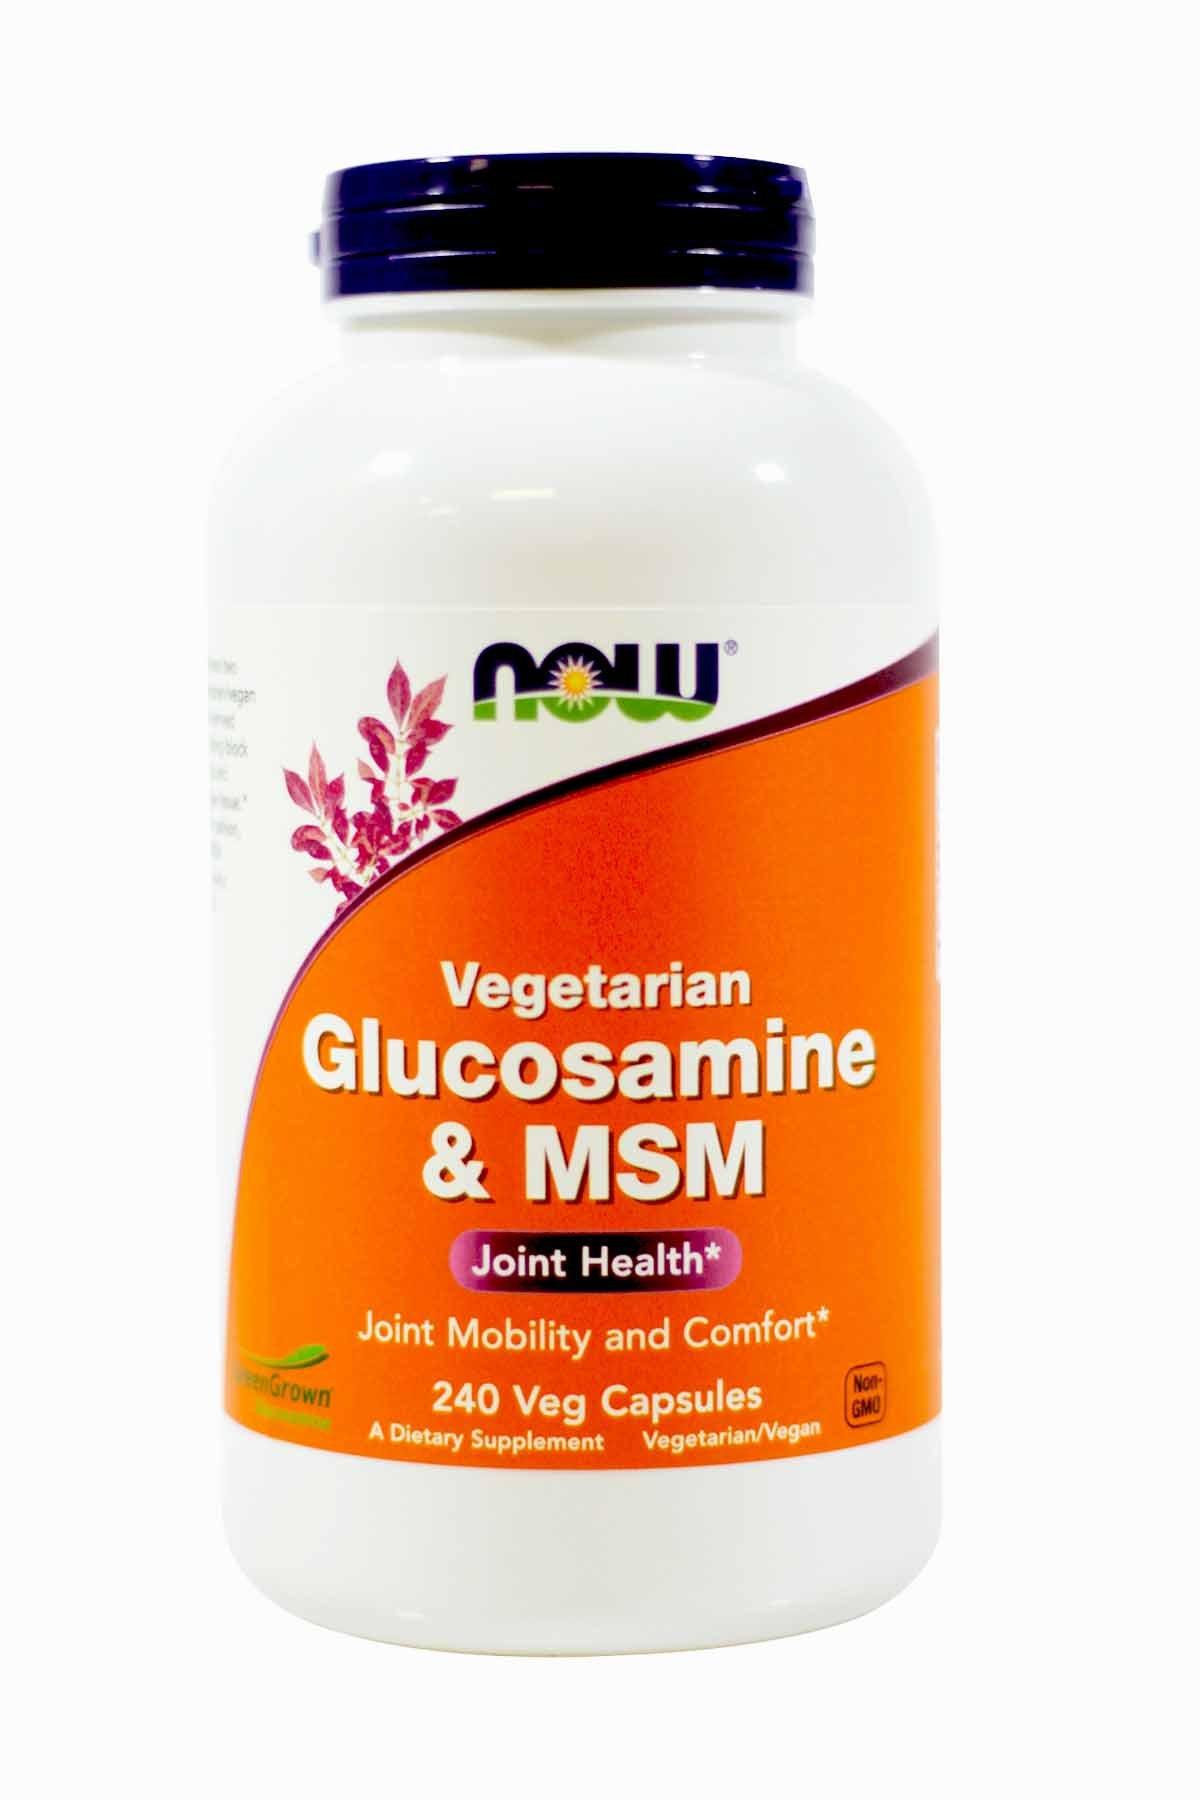 NowFoods Vegetarian Glucosamine & MSM Joint Health 240 Veg Capsules